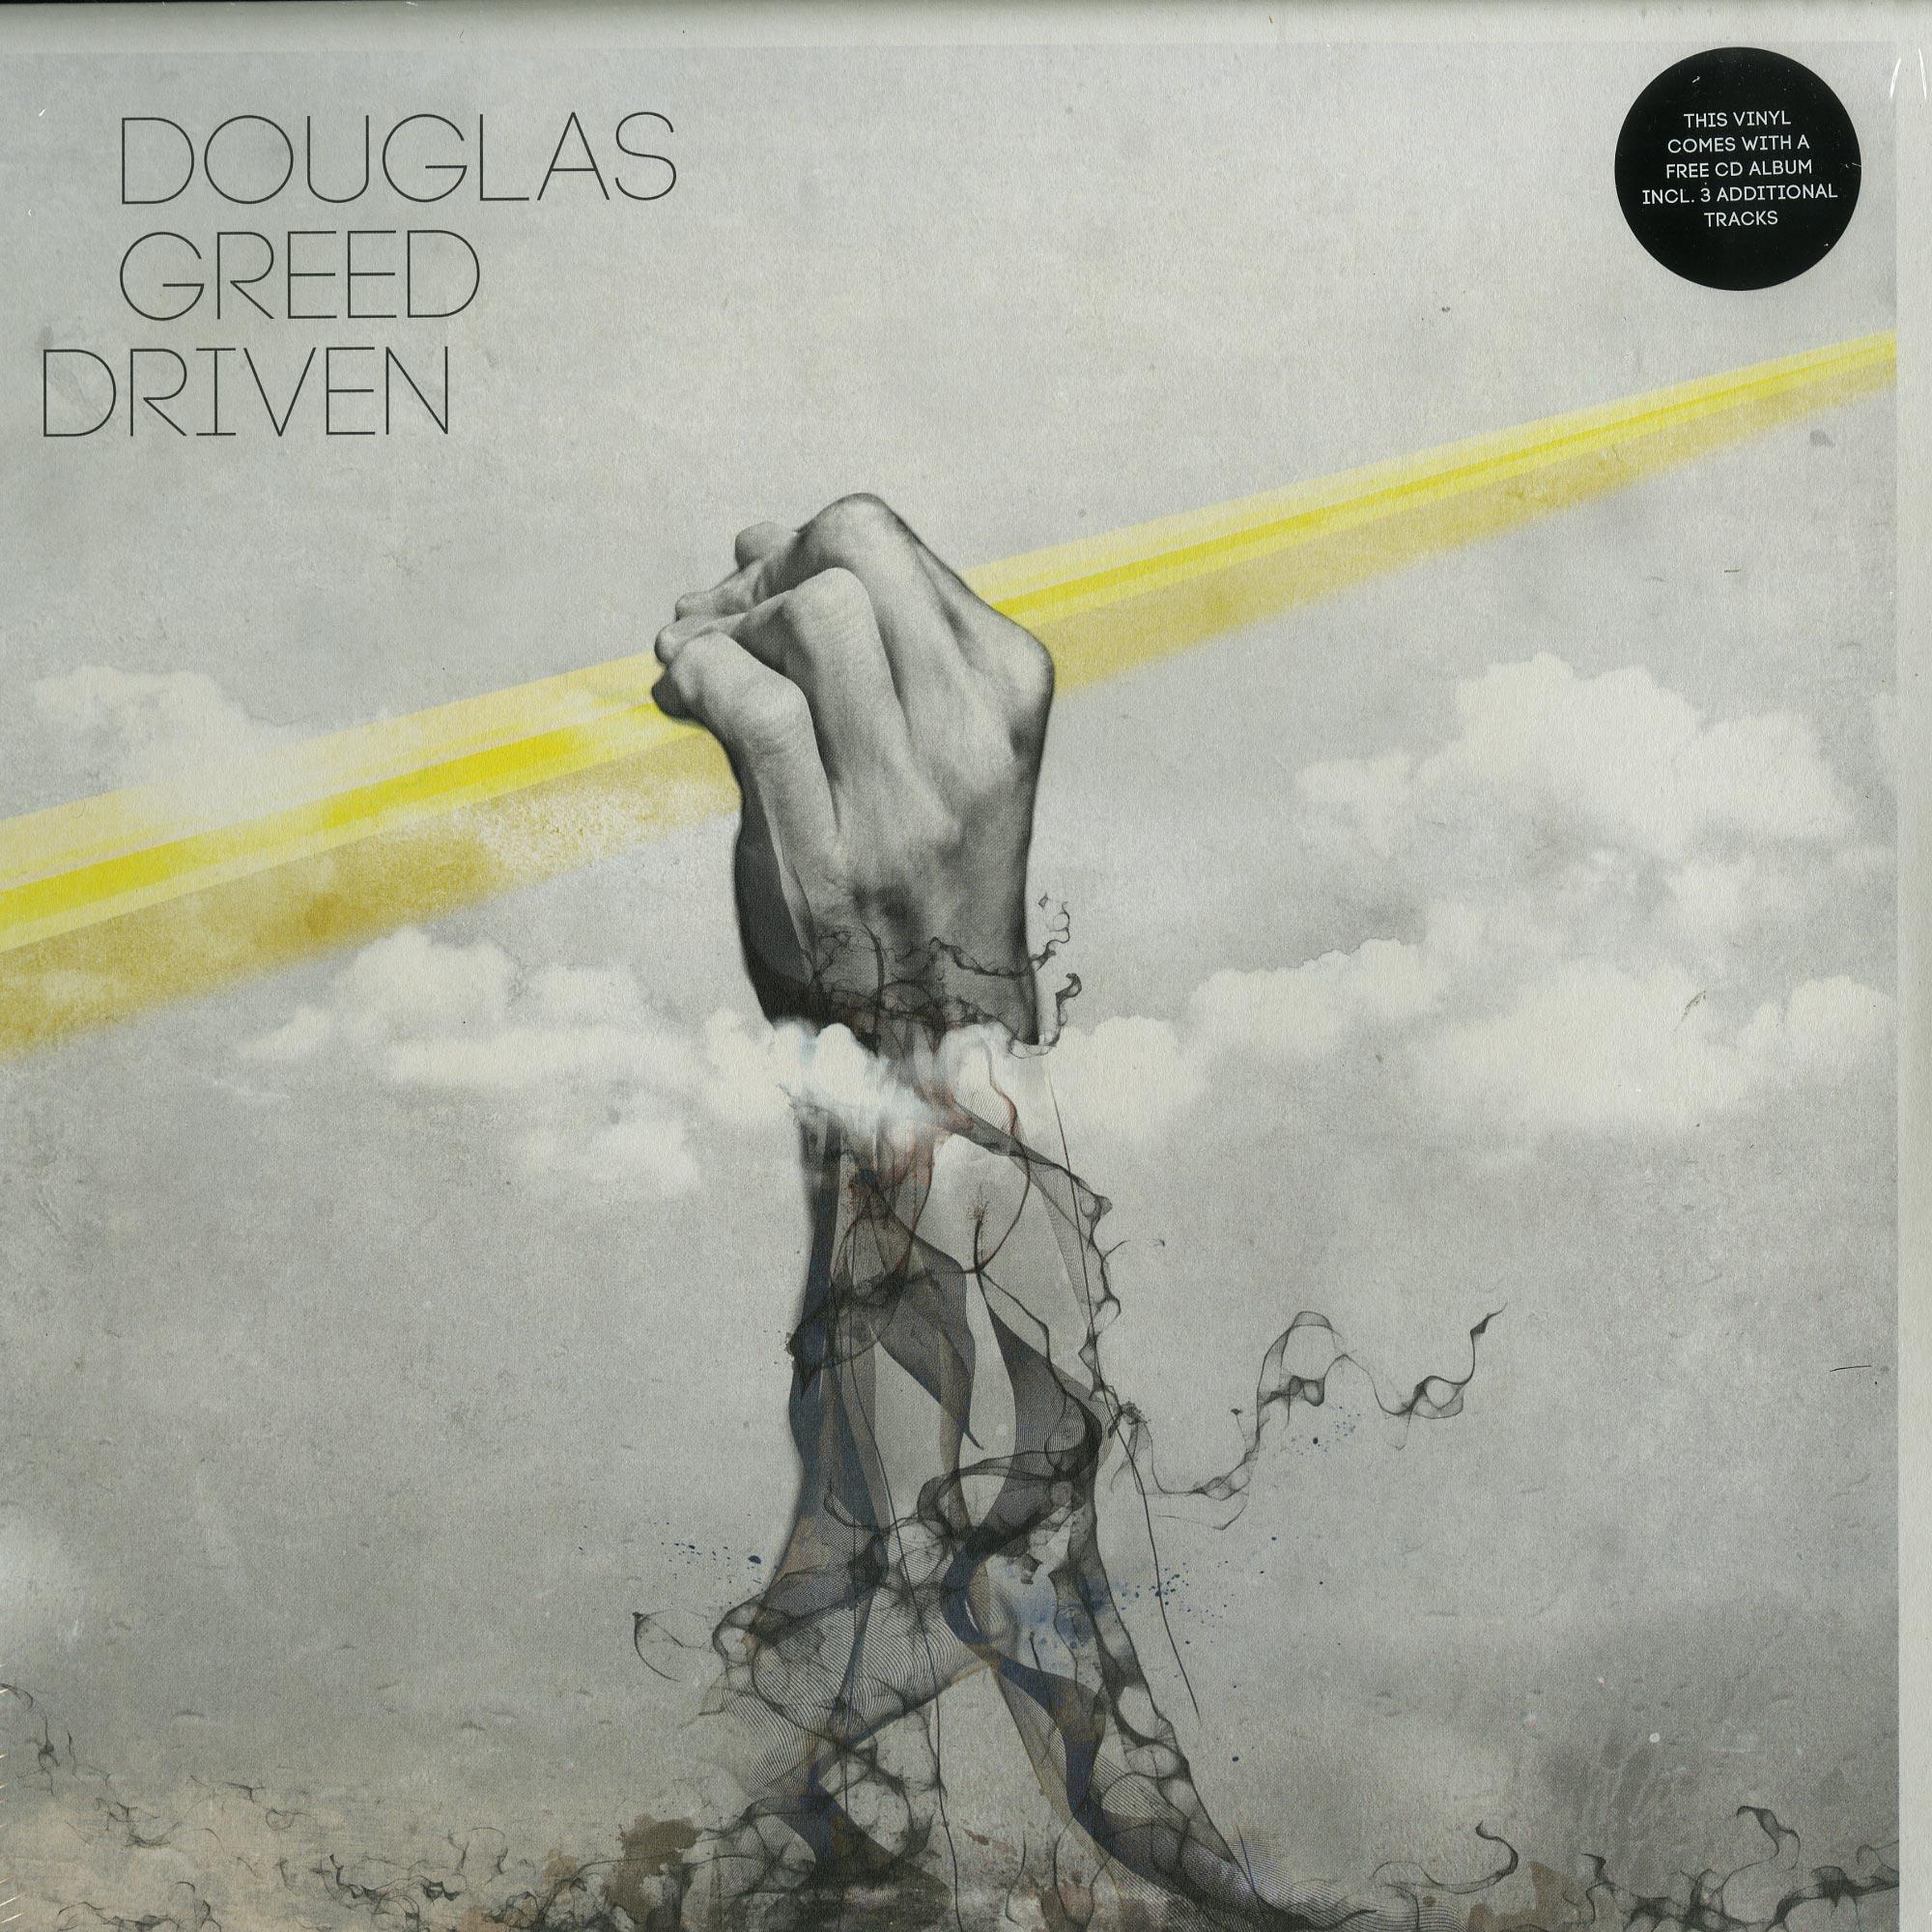 Douglas Greed - DRIVEN